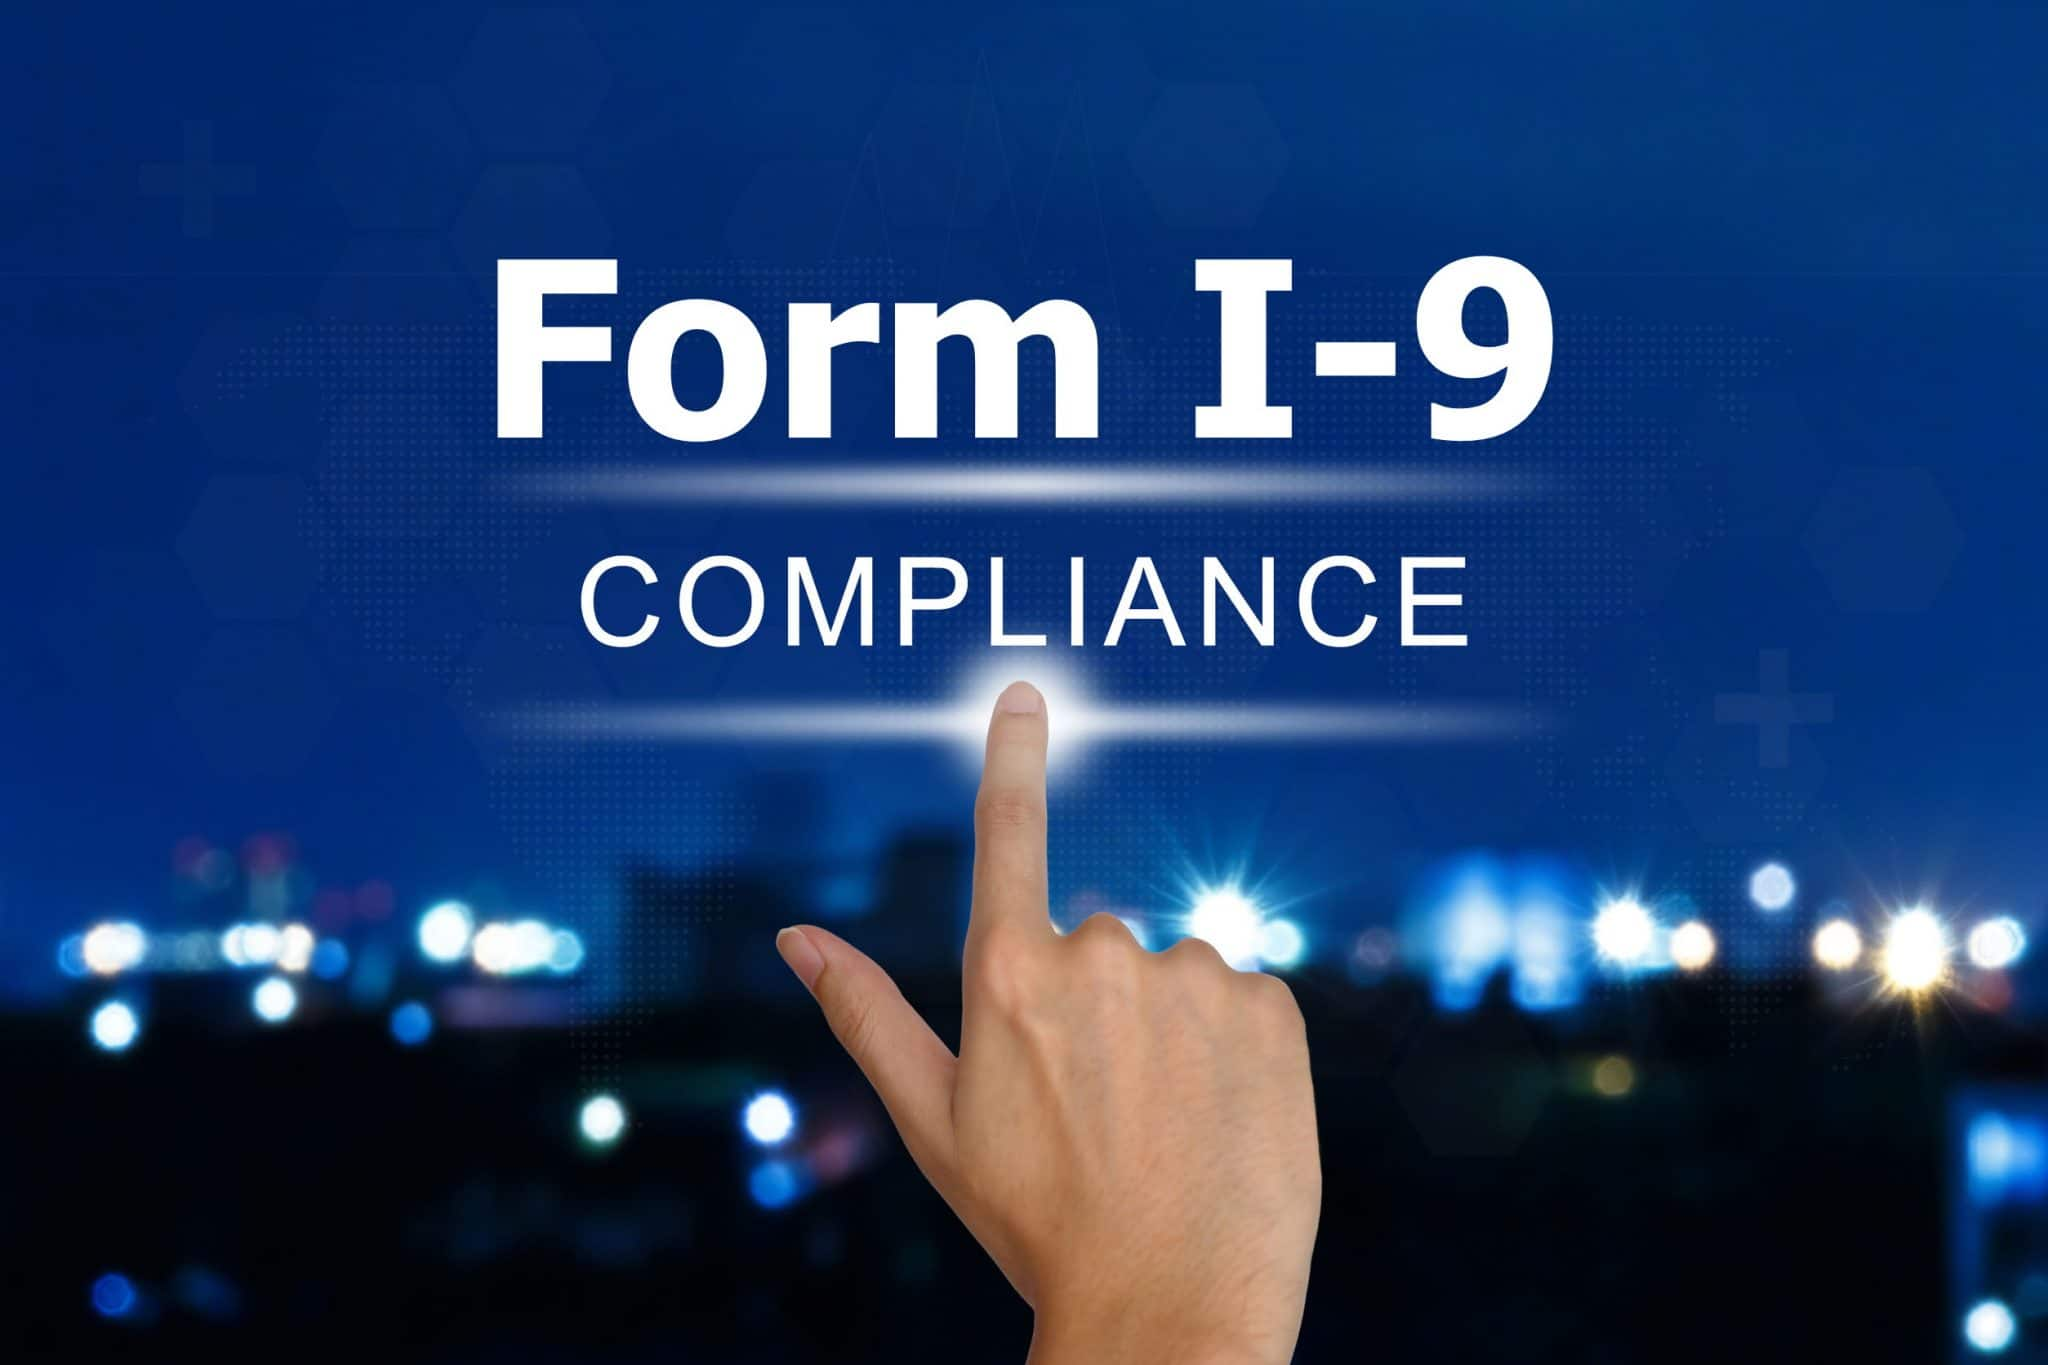 Form I-9 Compliance - Verification and Employment Certification Program